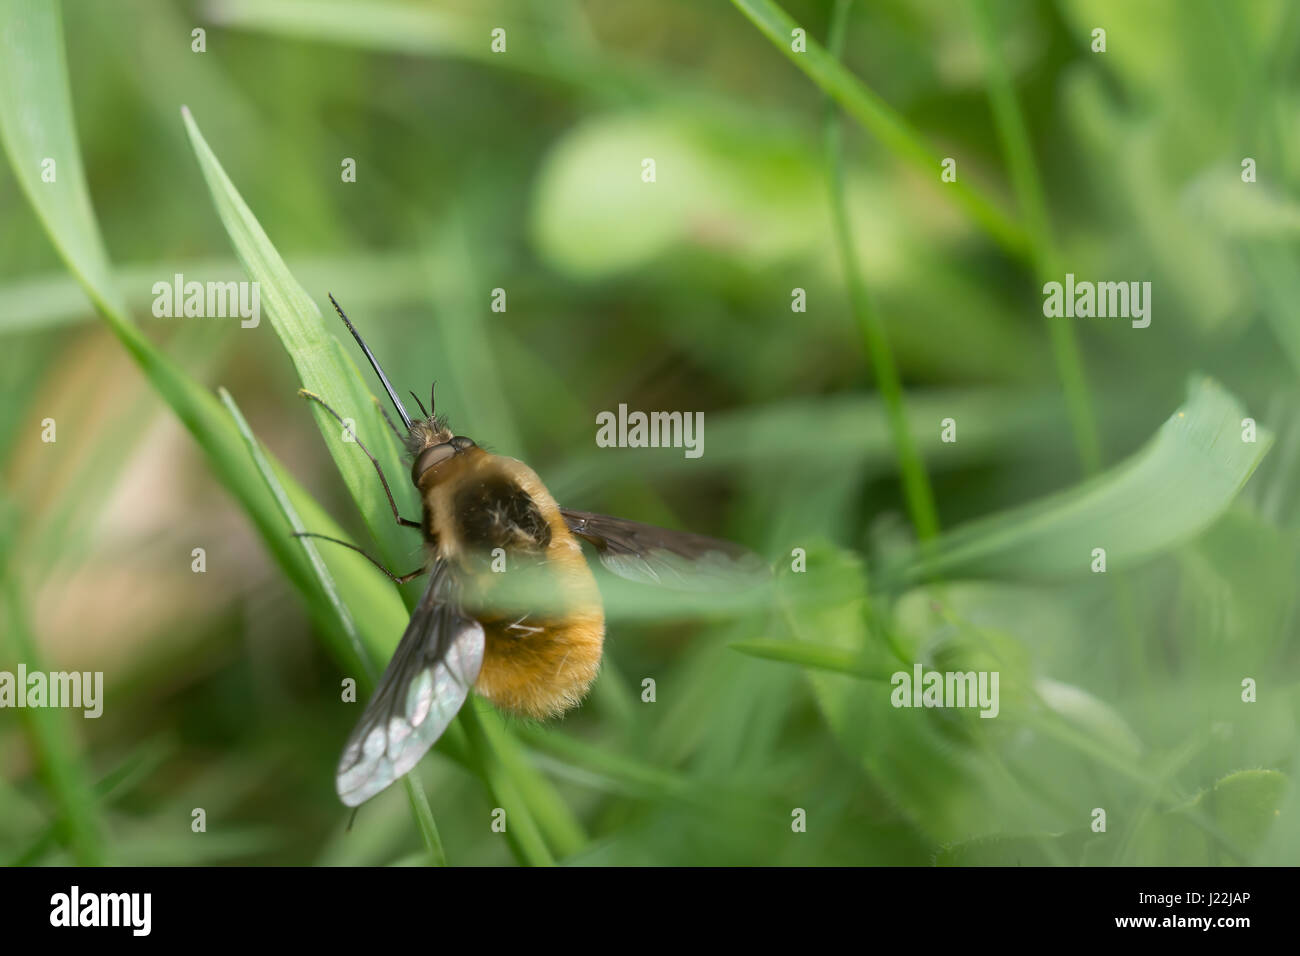 Grand bee fly (Bombylius major) reposant sur une feuille. Selective focus Photo Stock